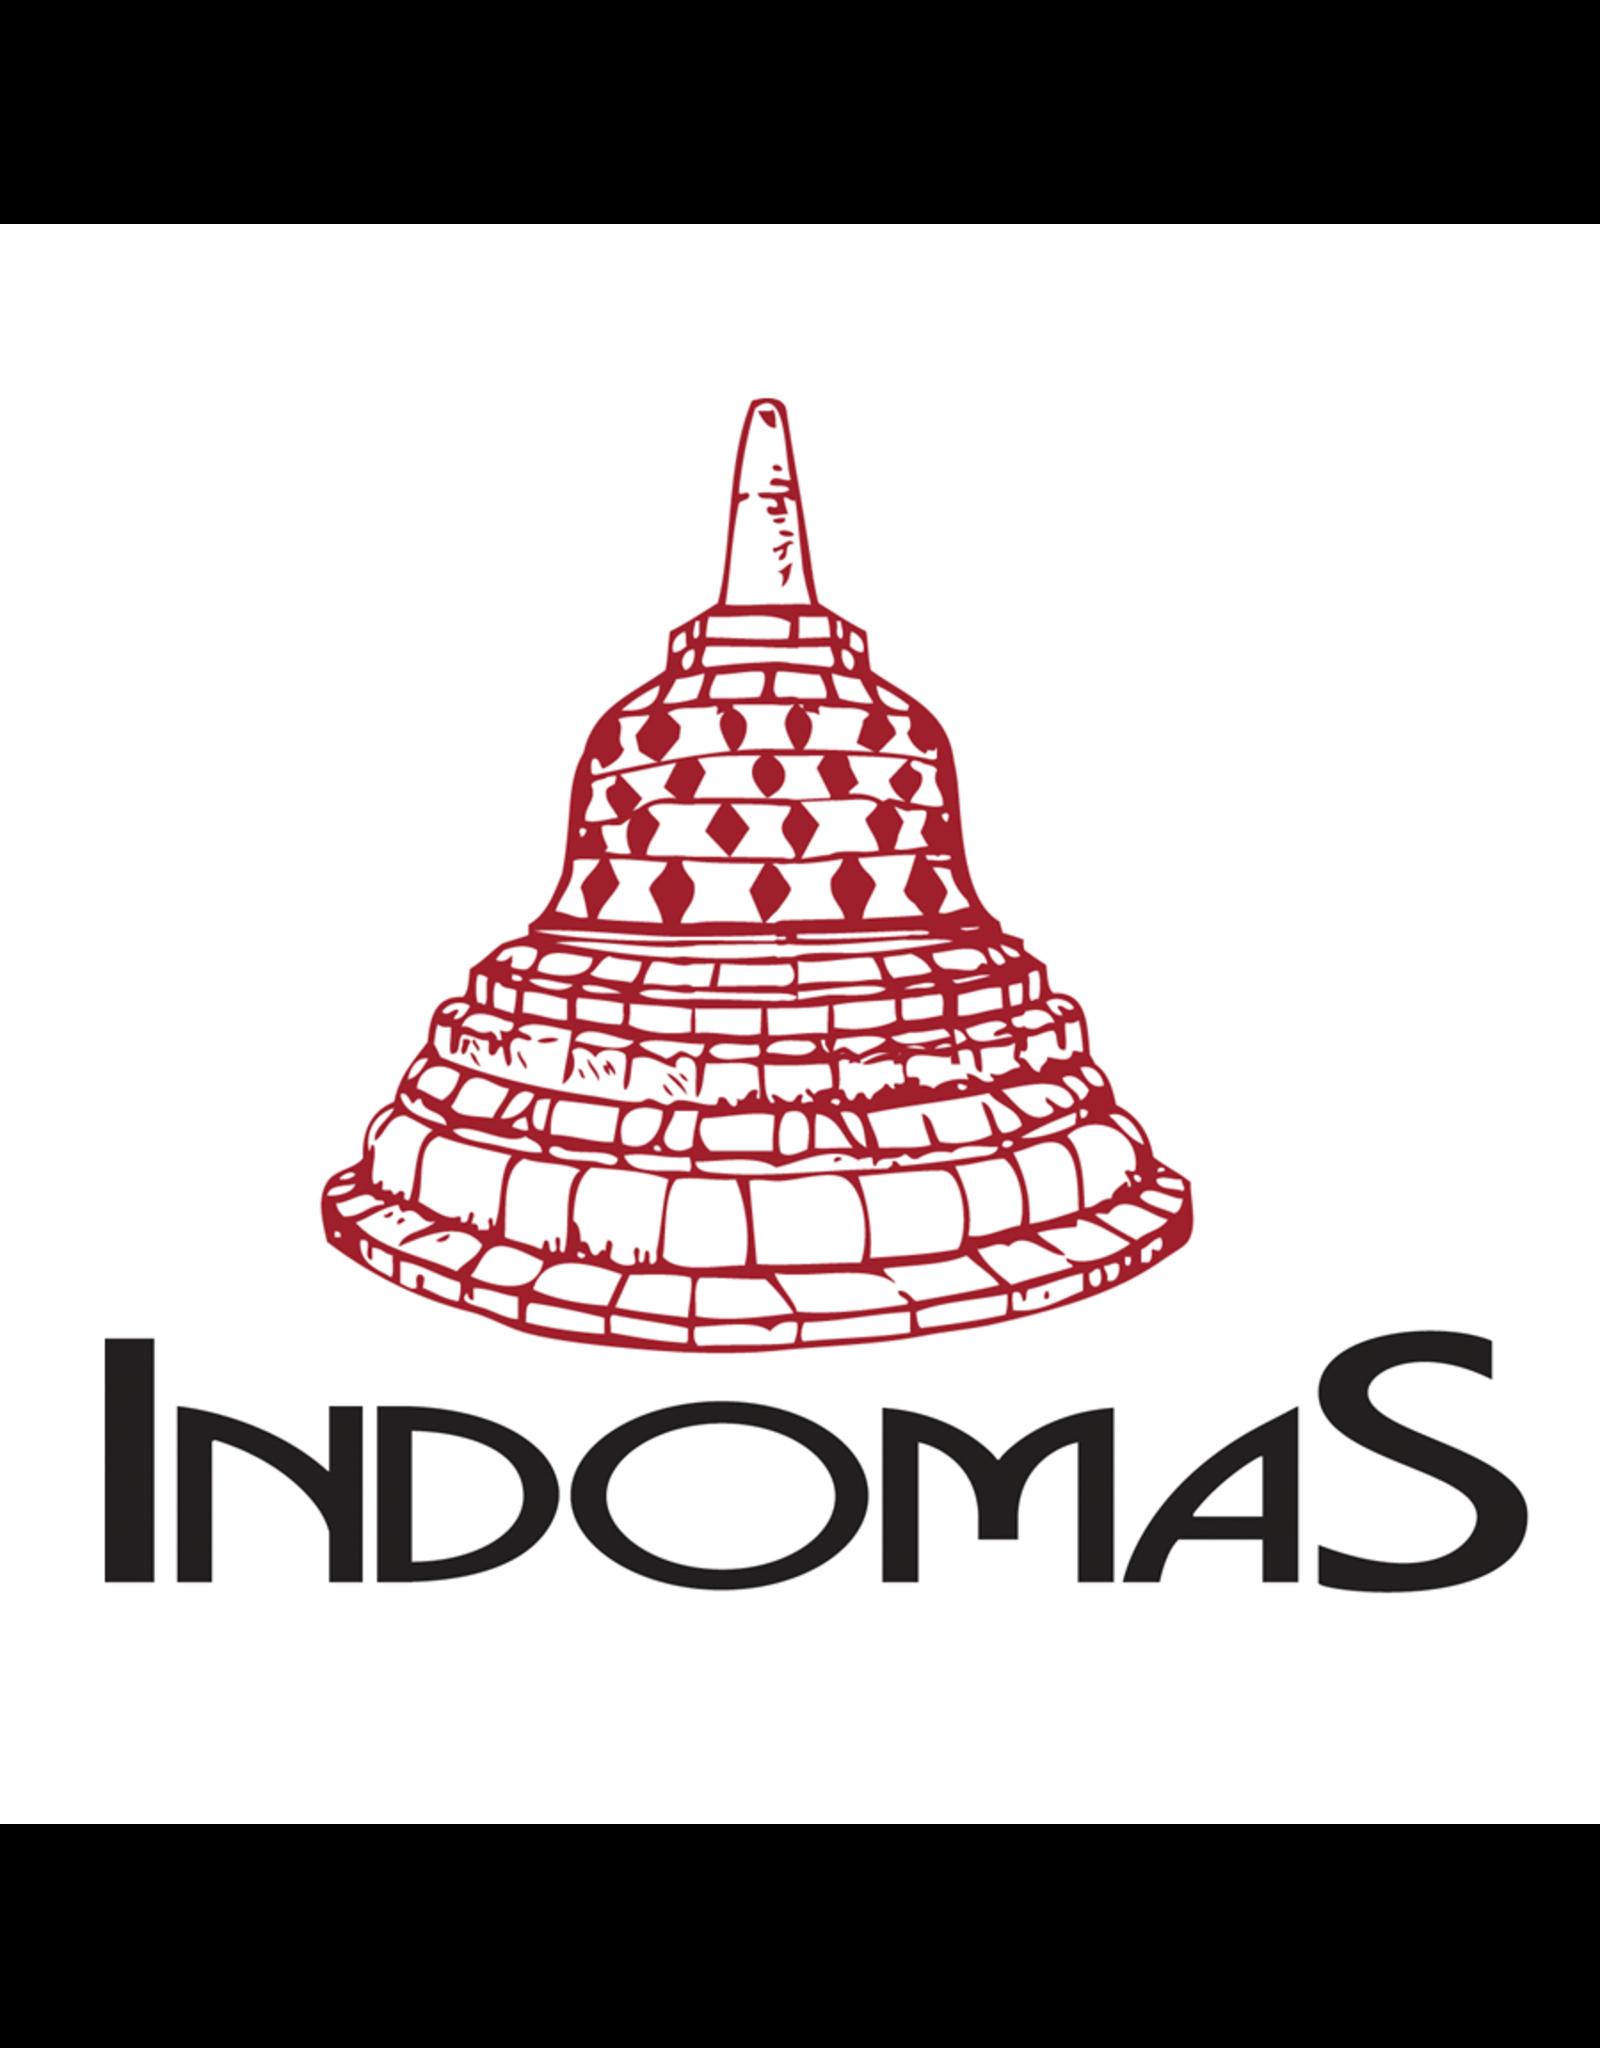 Indonesia Krupuk Udang